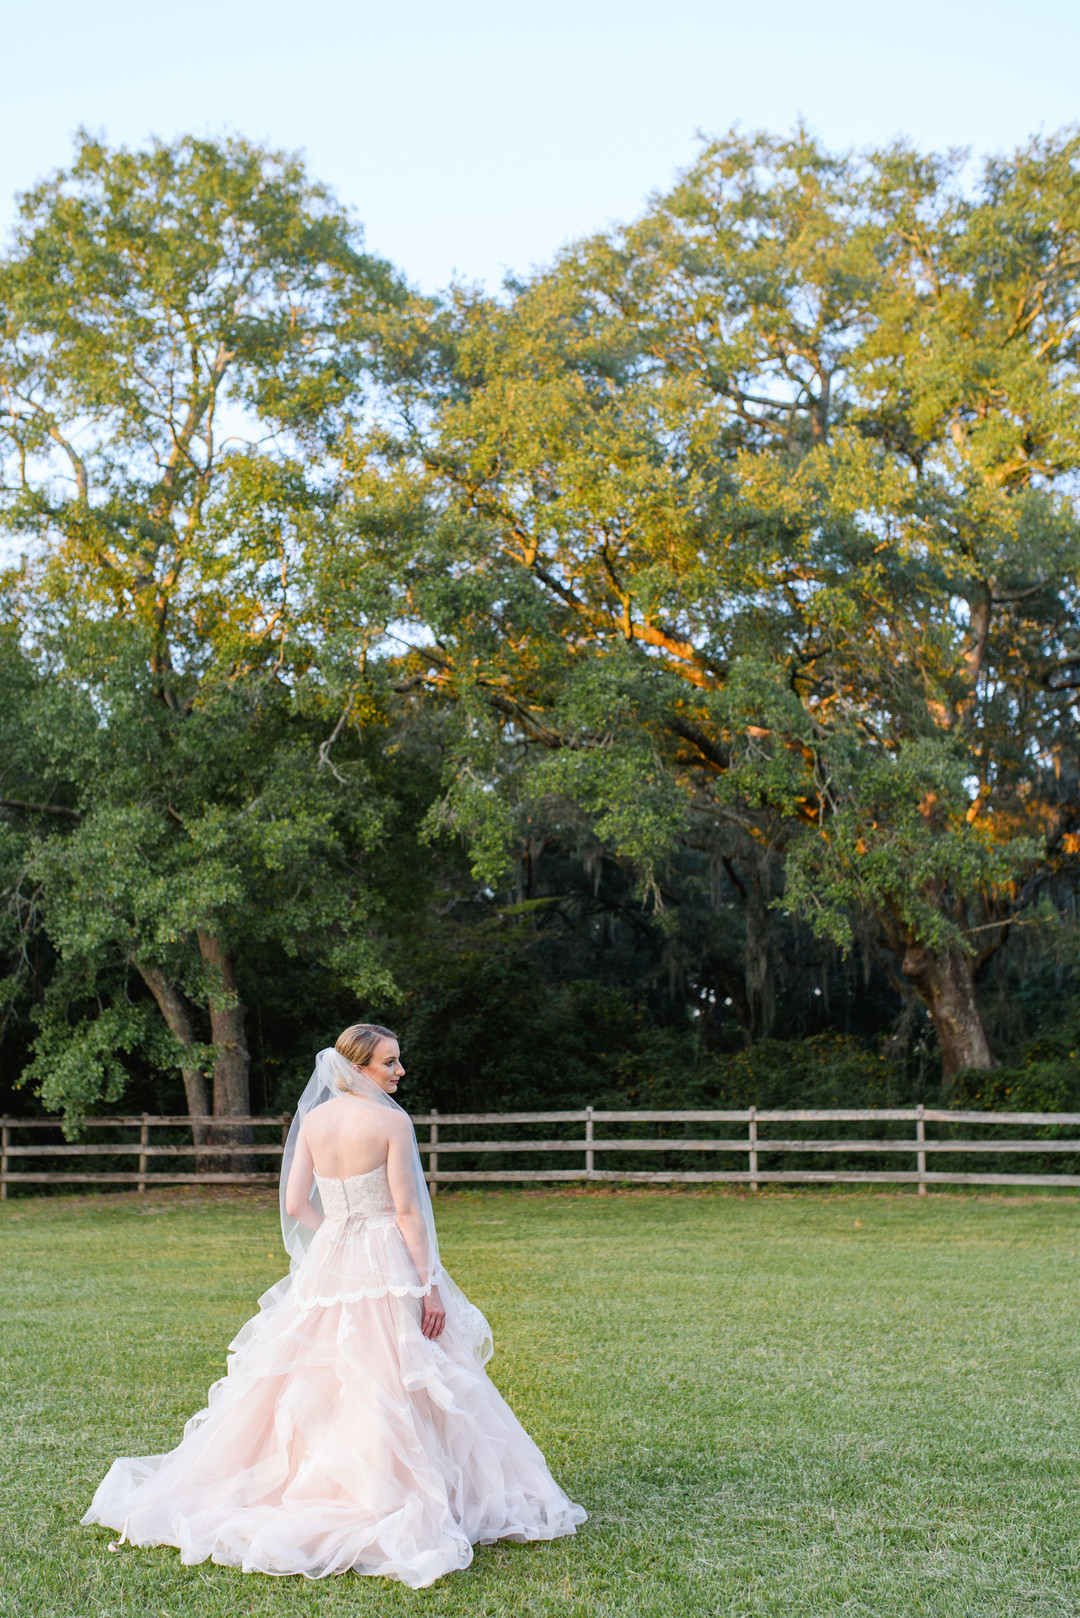 old-wide-awake-plantation-wedding-6.JPG